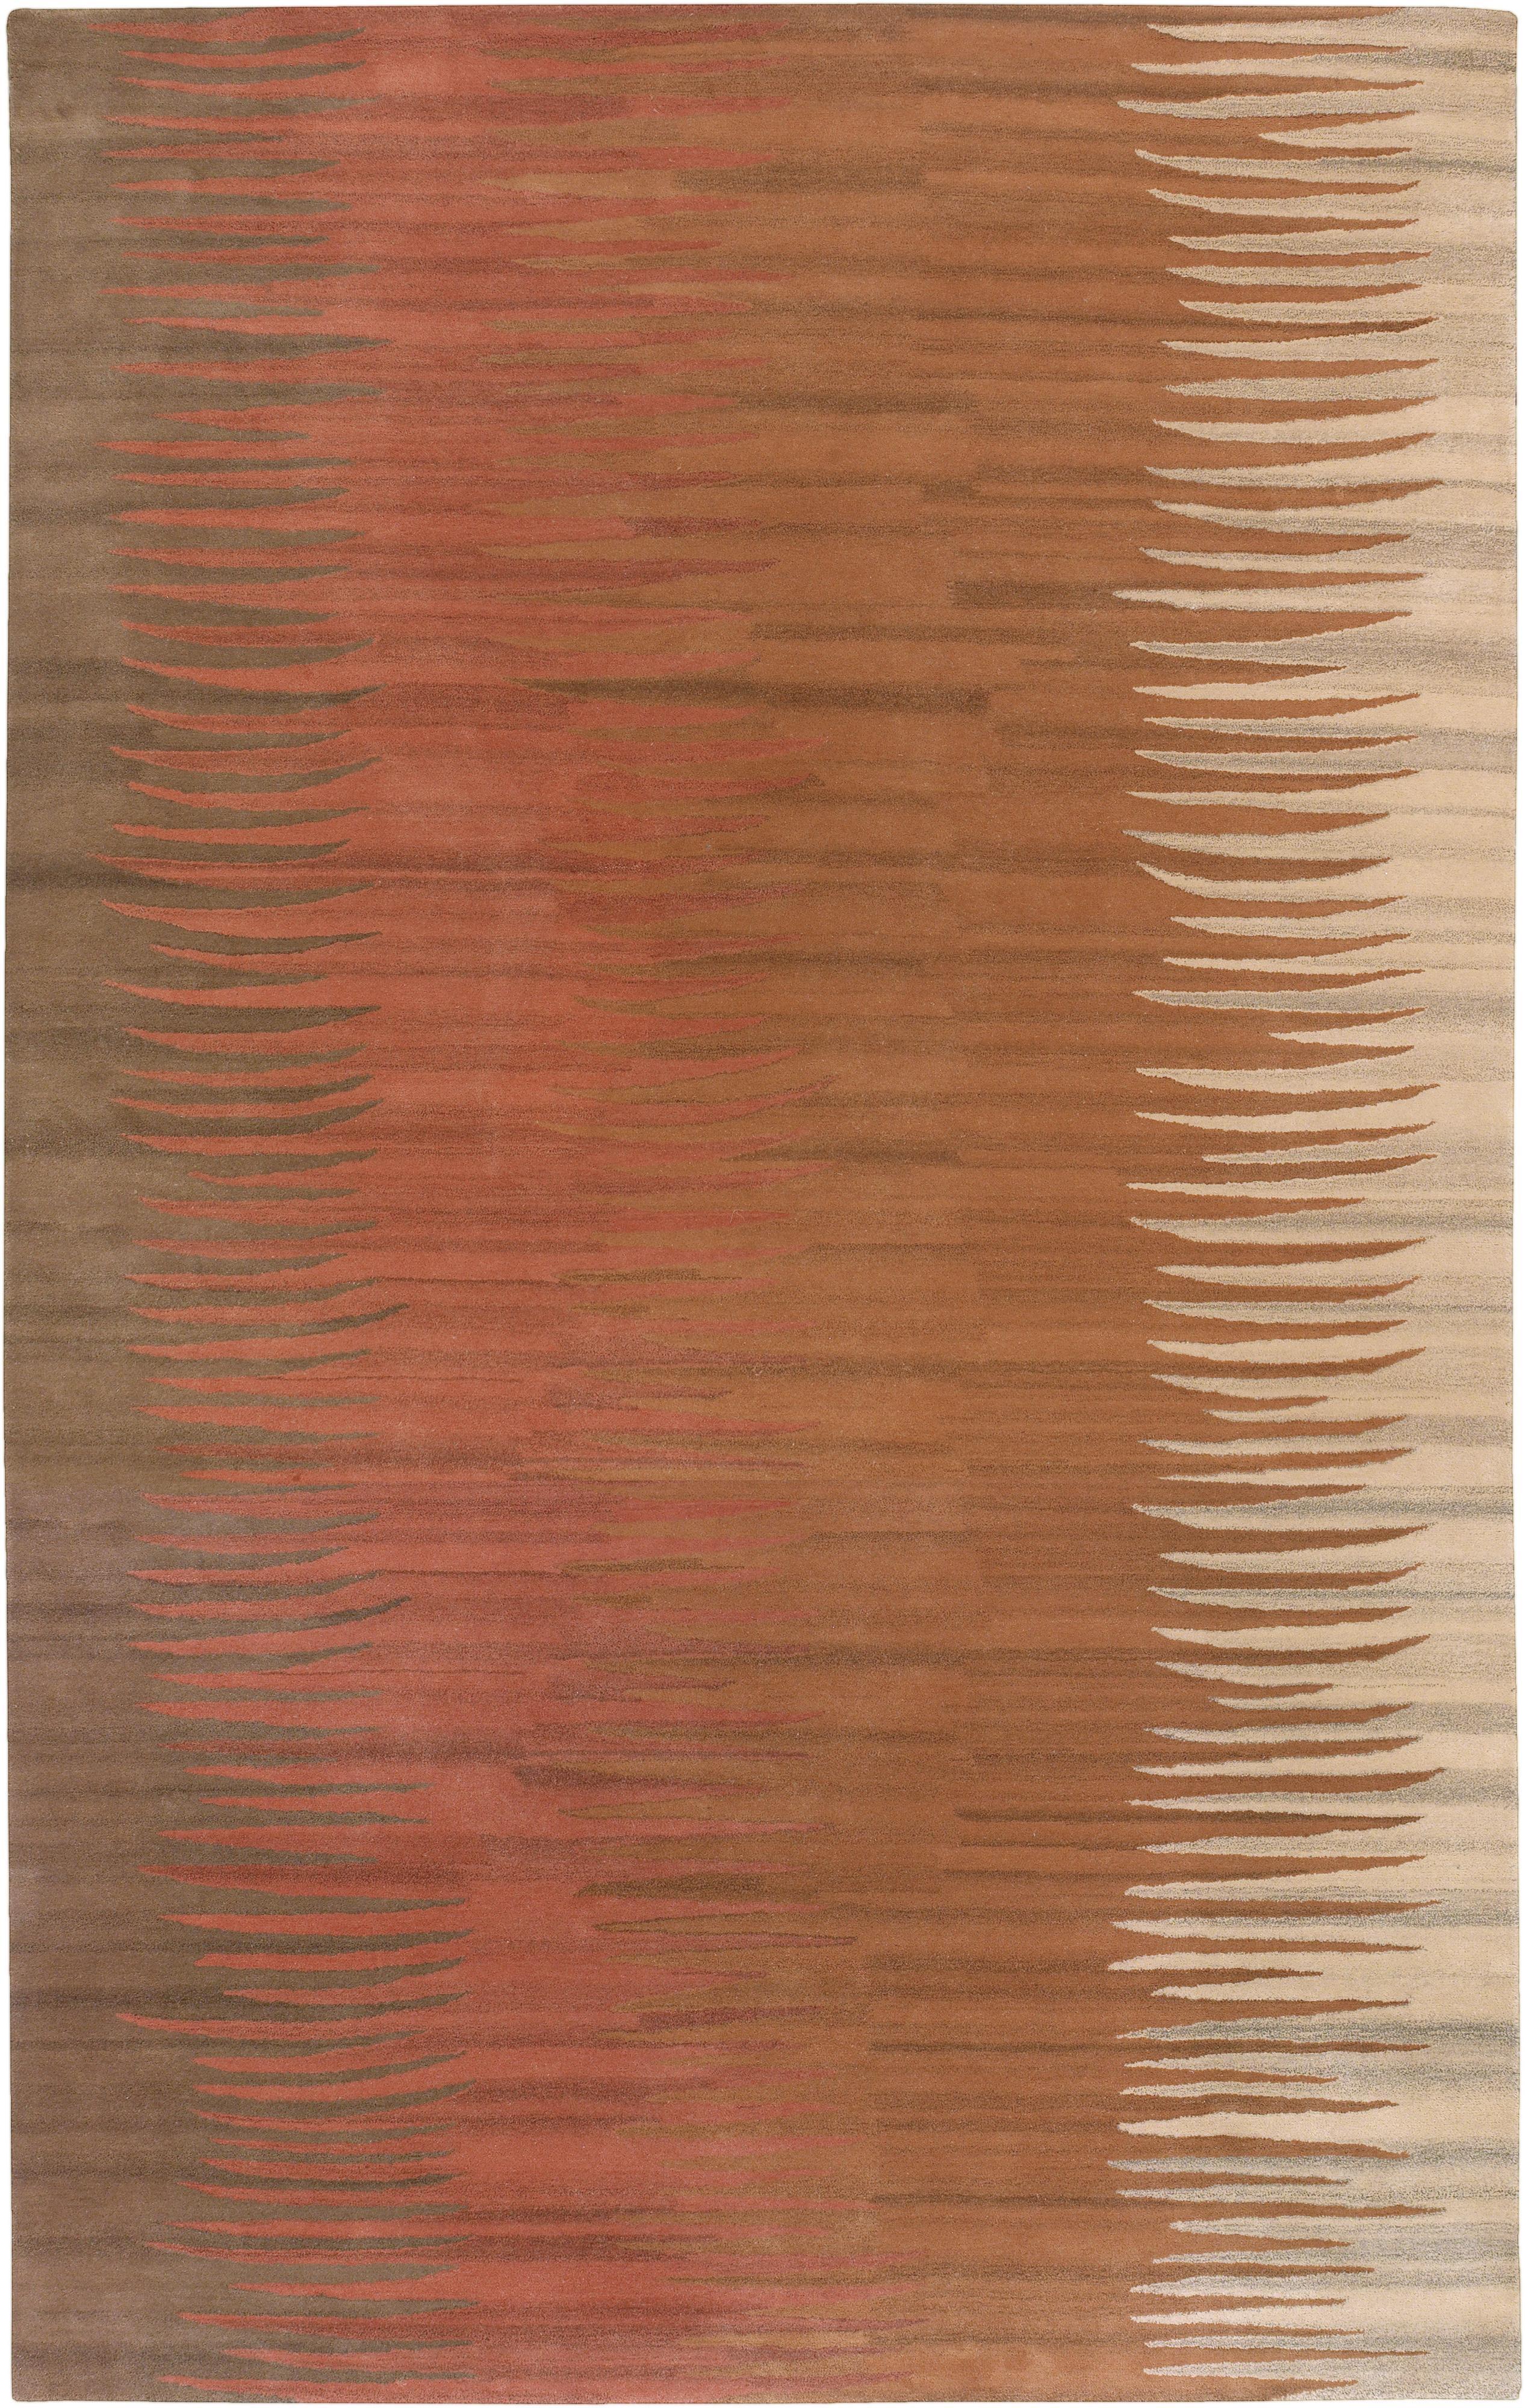 Surya Rugs Mosaic 9' x 13' - Item Number: MOS1004-913